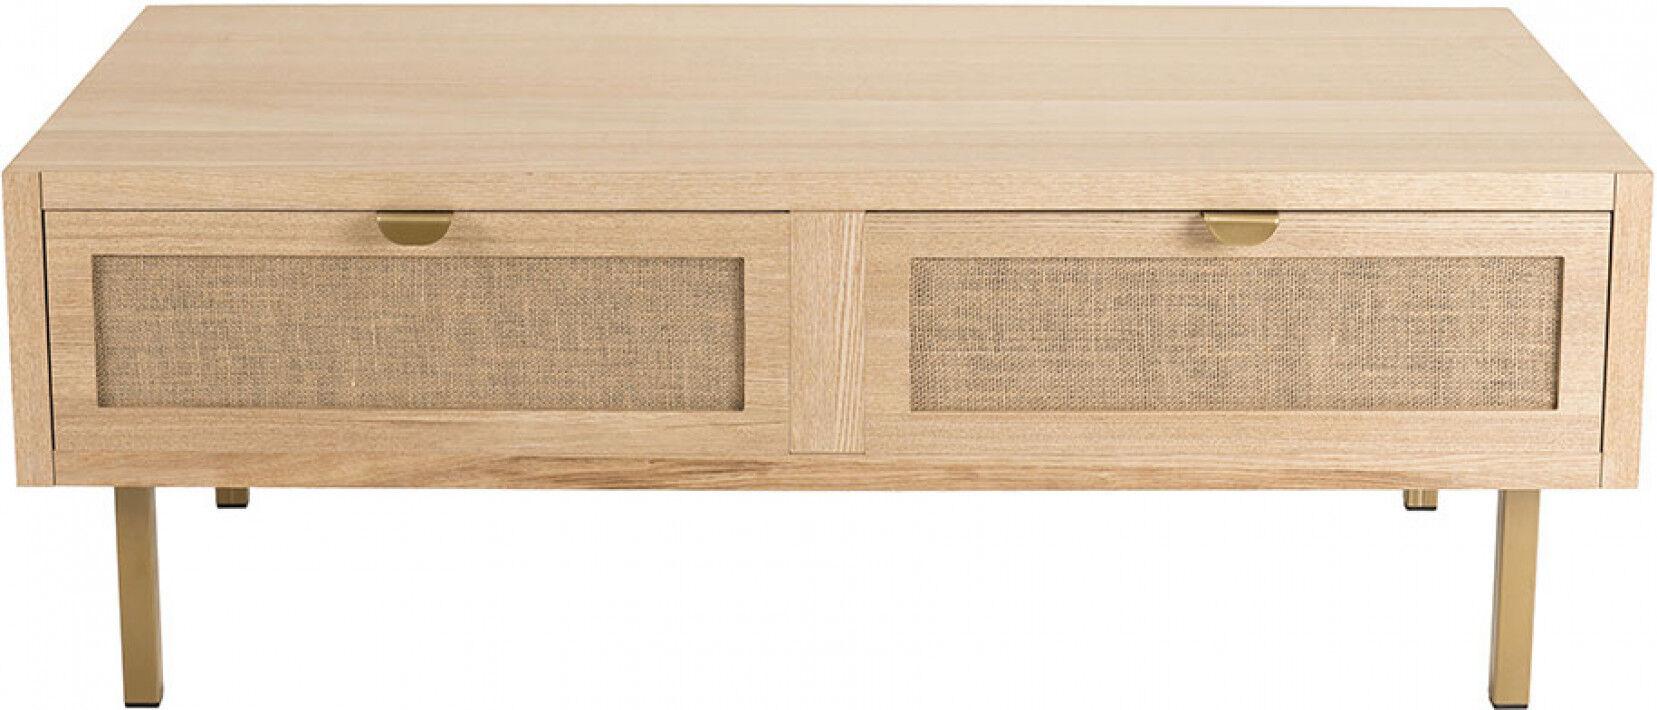 Table basse 2 tiroirs toile de jute - ALY